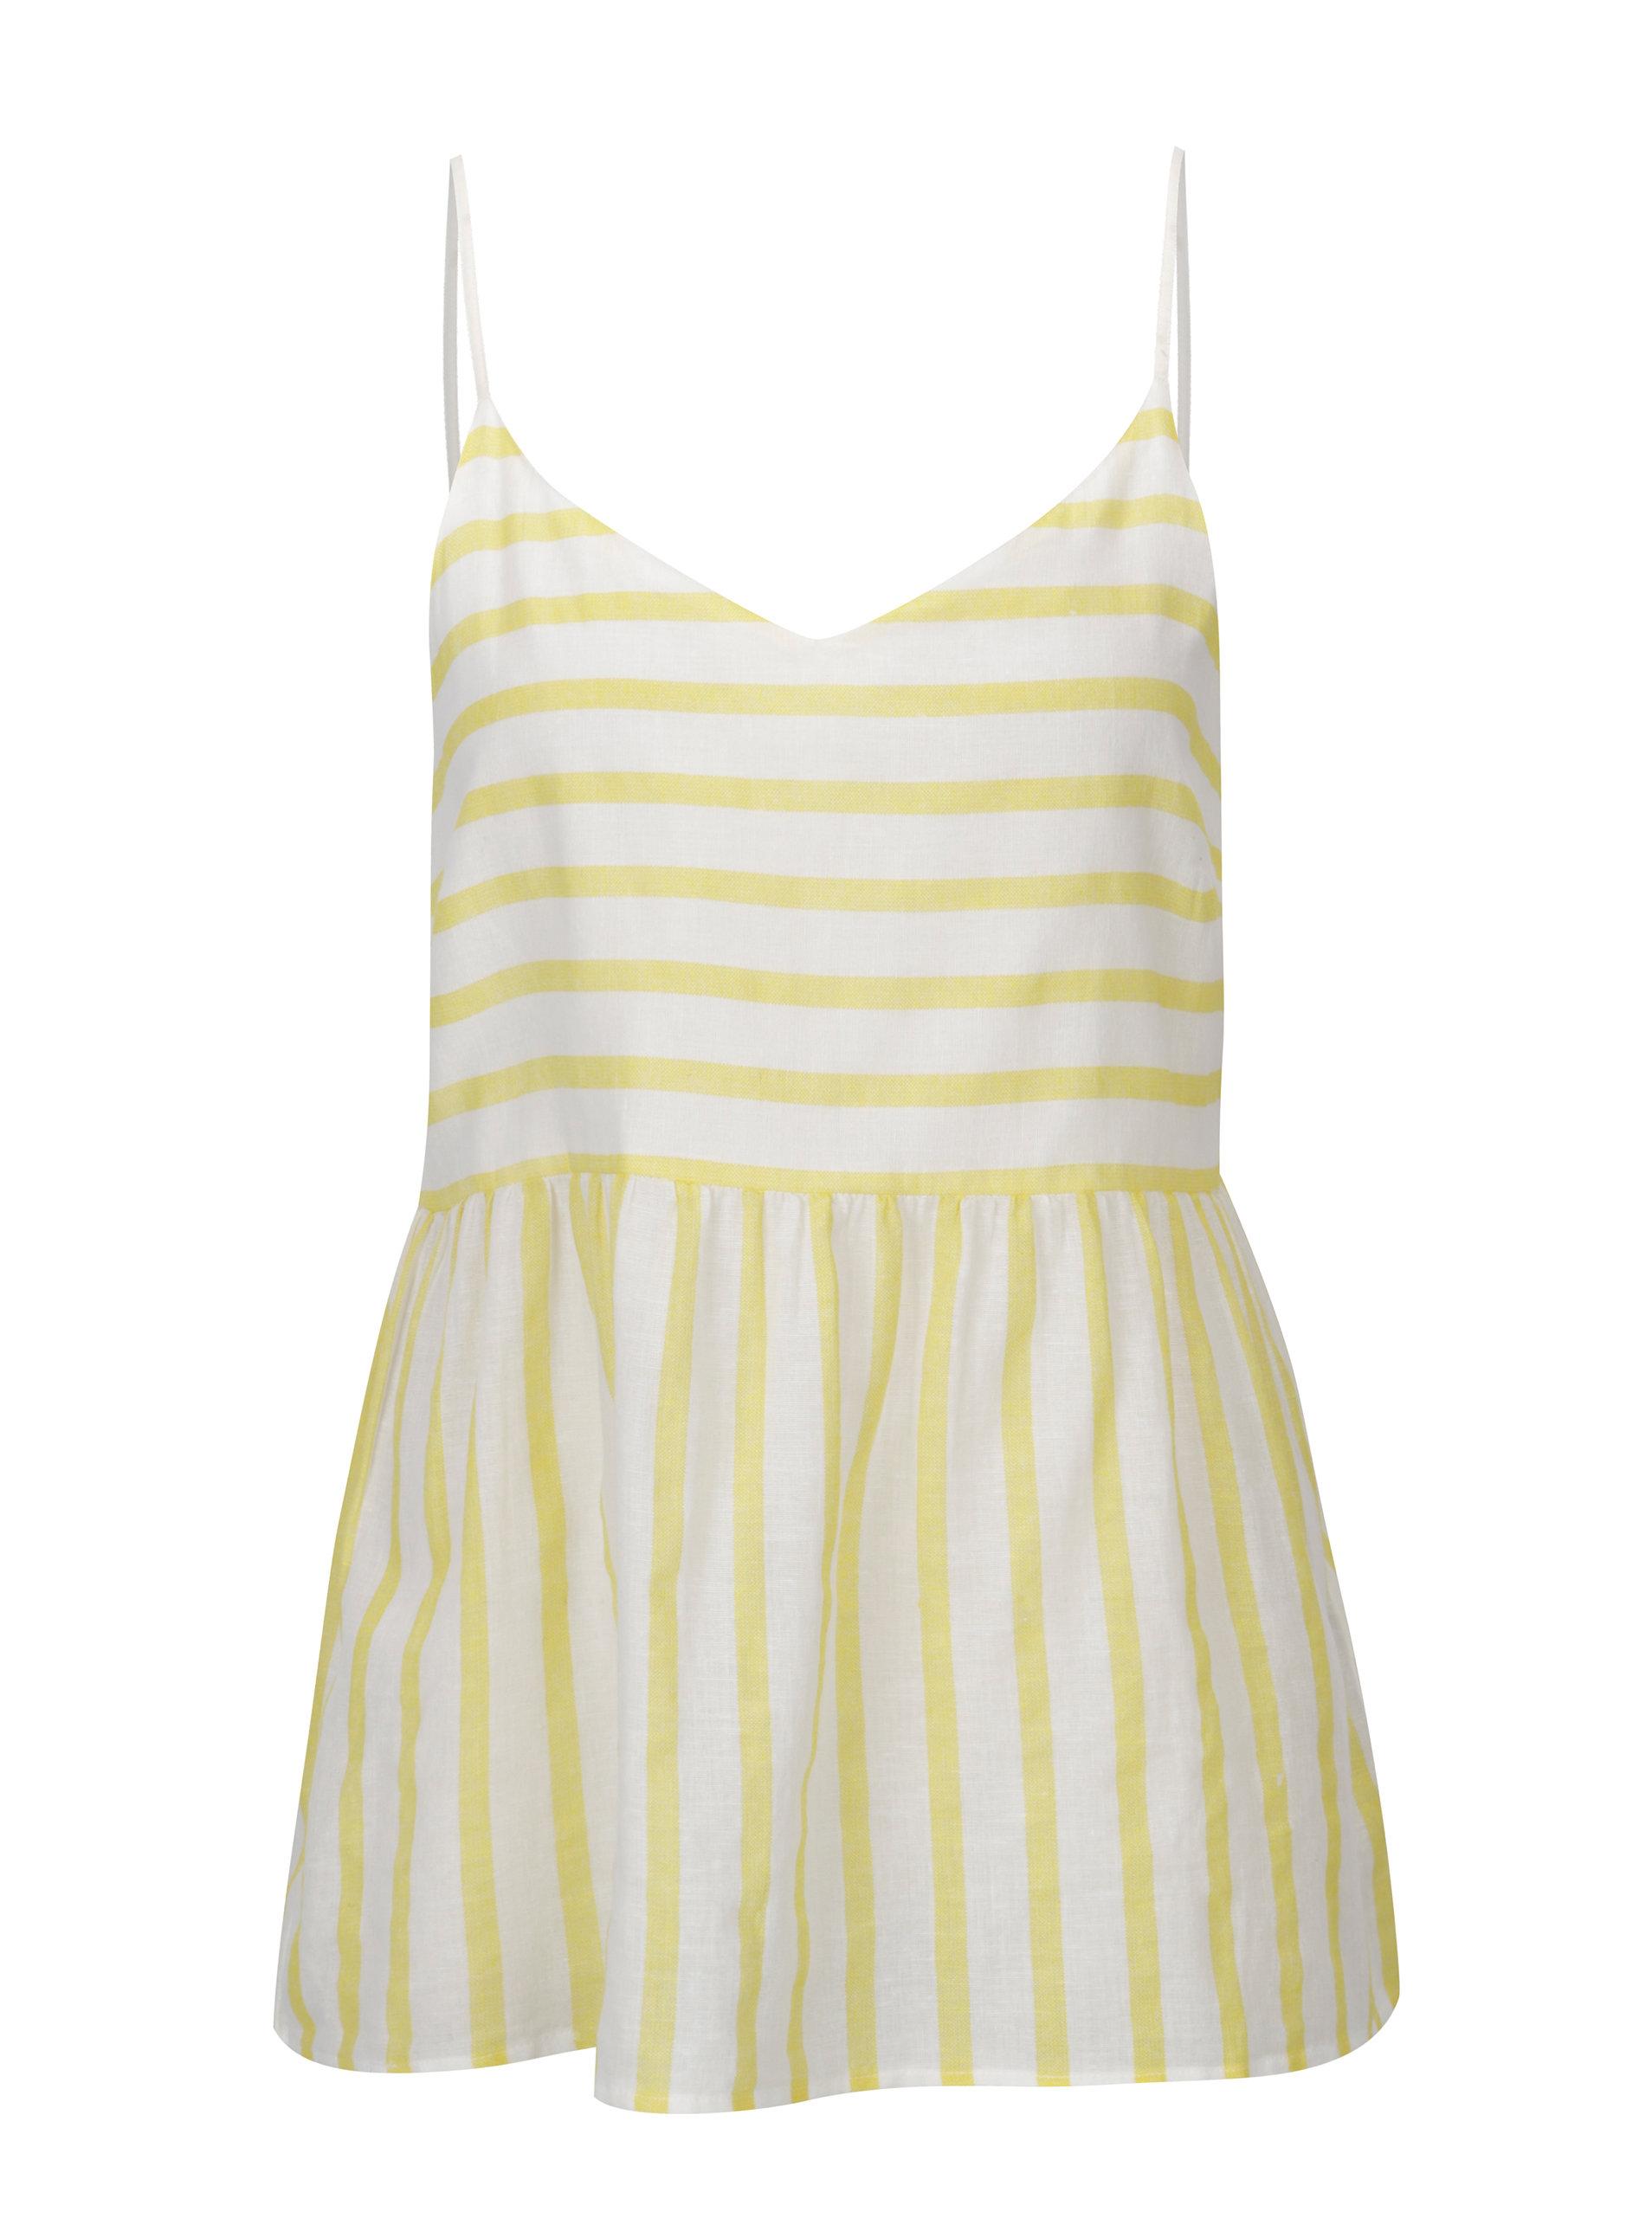 679b0e284c6 Bílo-žluté pruhované tílko VERO MODA Sunny ...